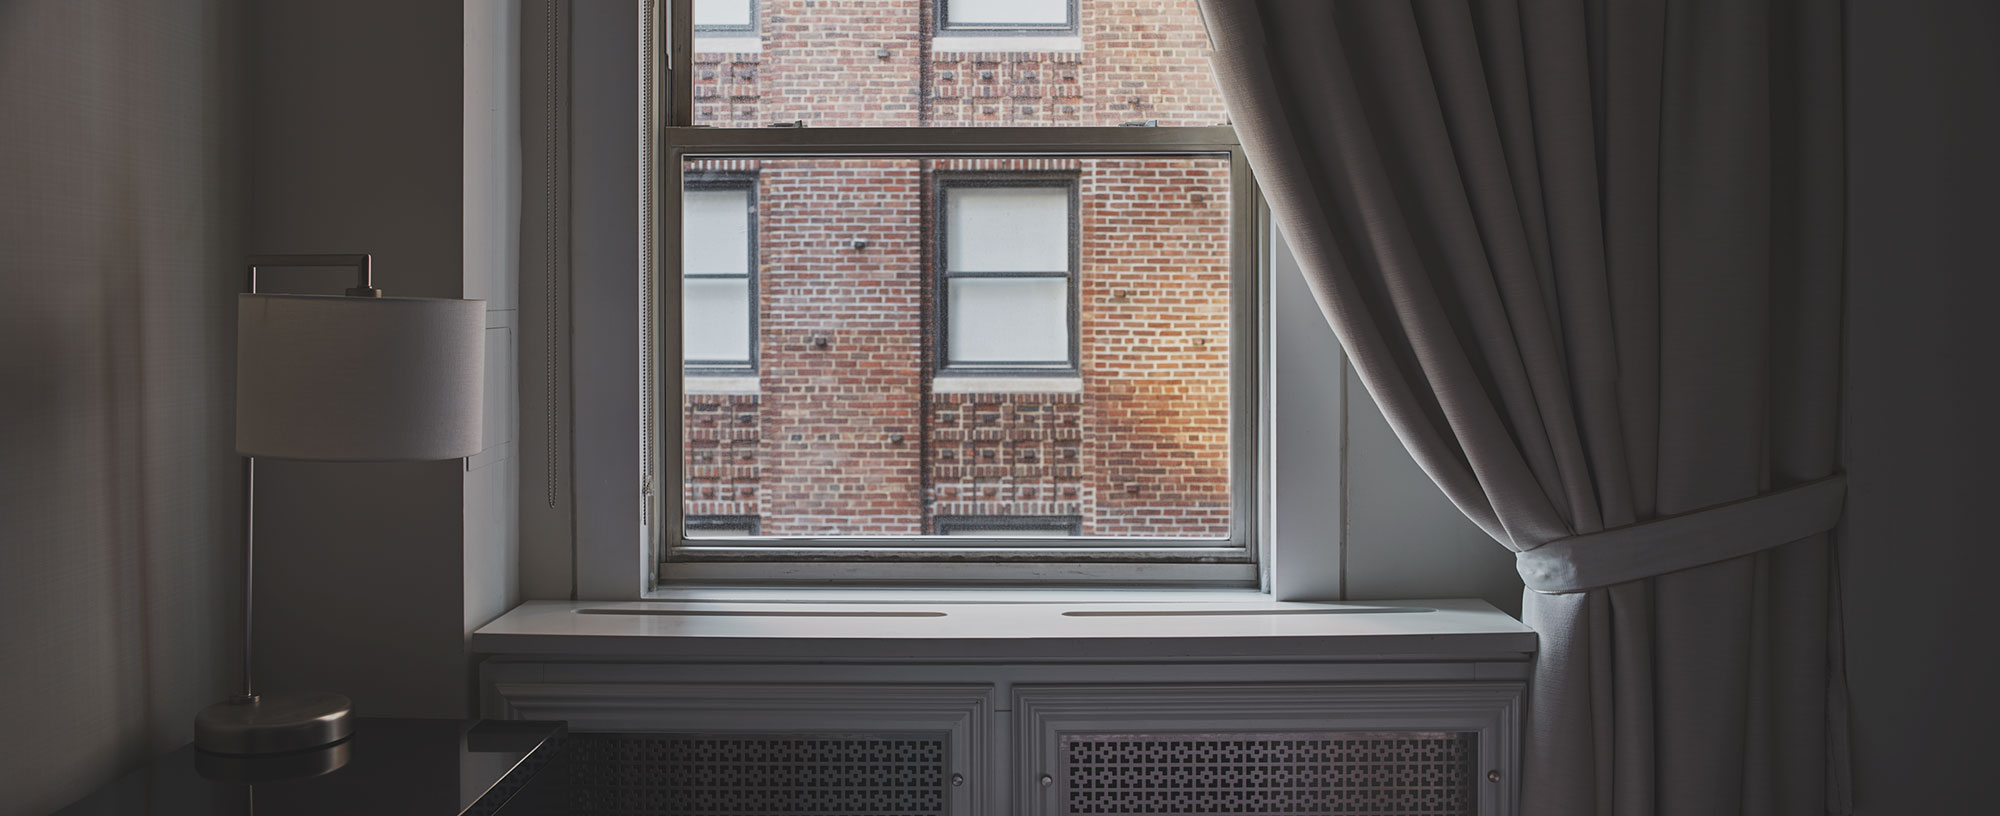 hotel-room-pano.jpg